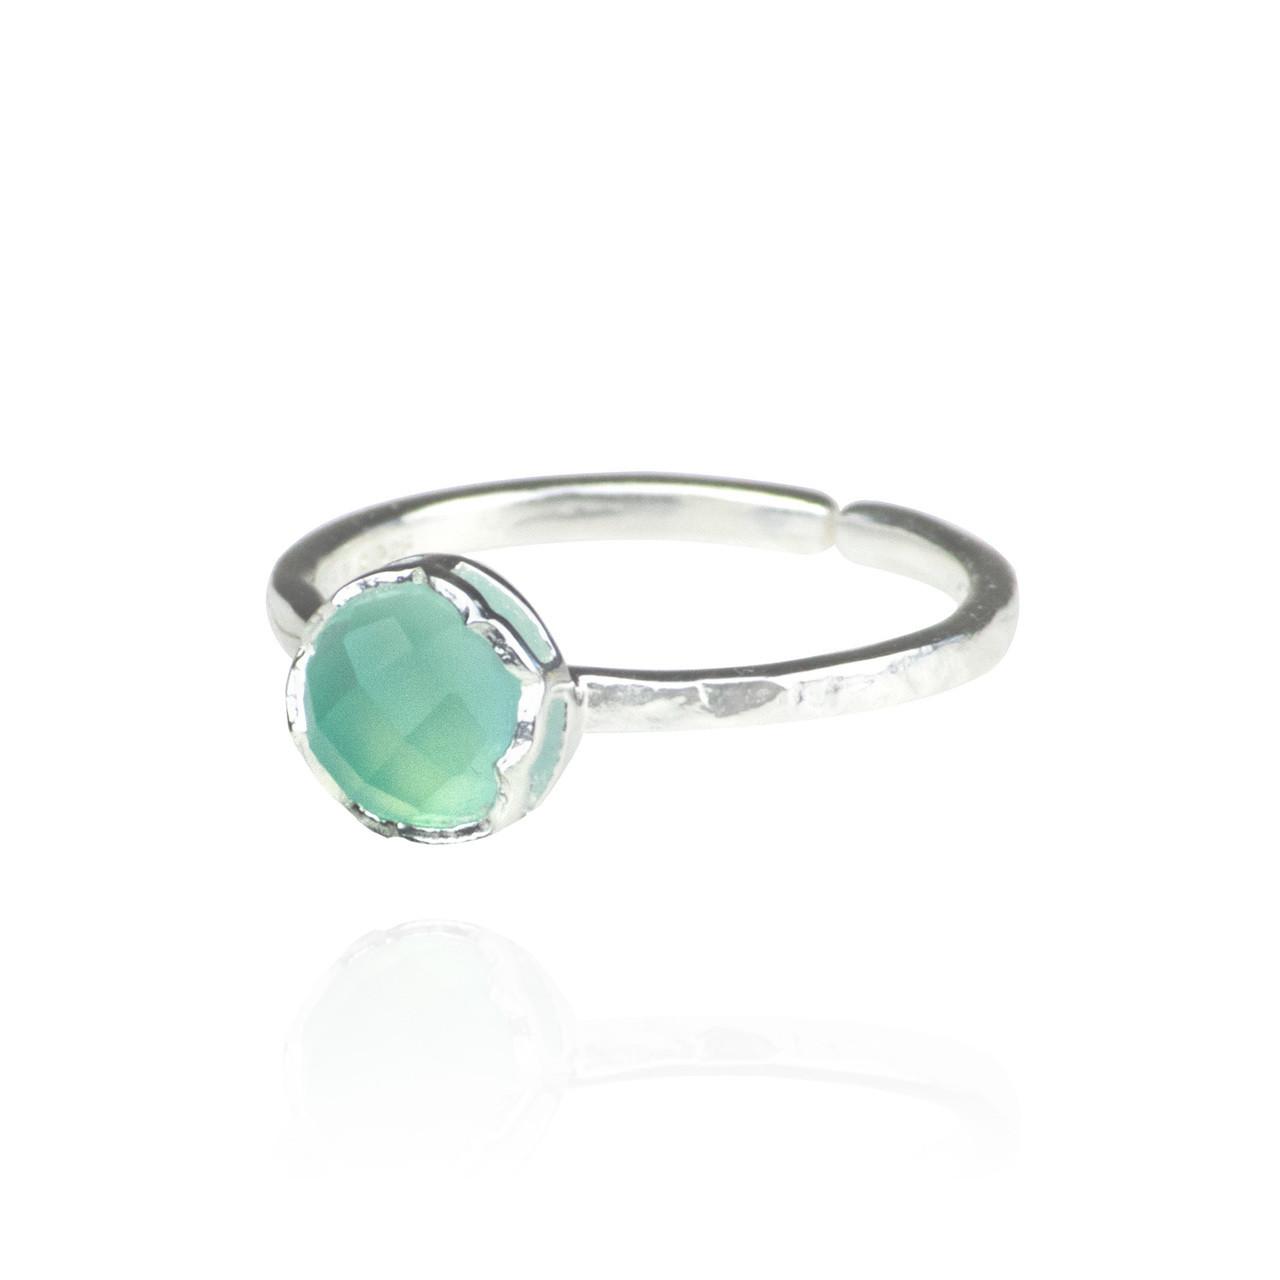 Zefyr Dosha Bracelet Sterling Silver With Aqua Chalcedony PHxkwA0Uc8